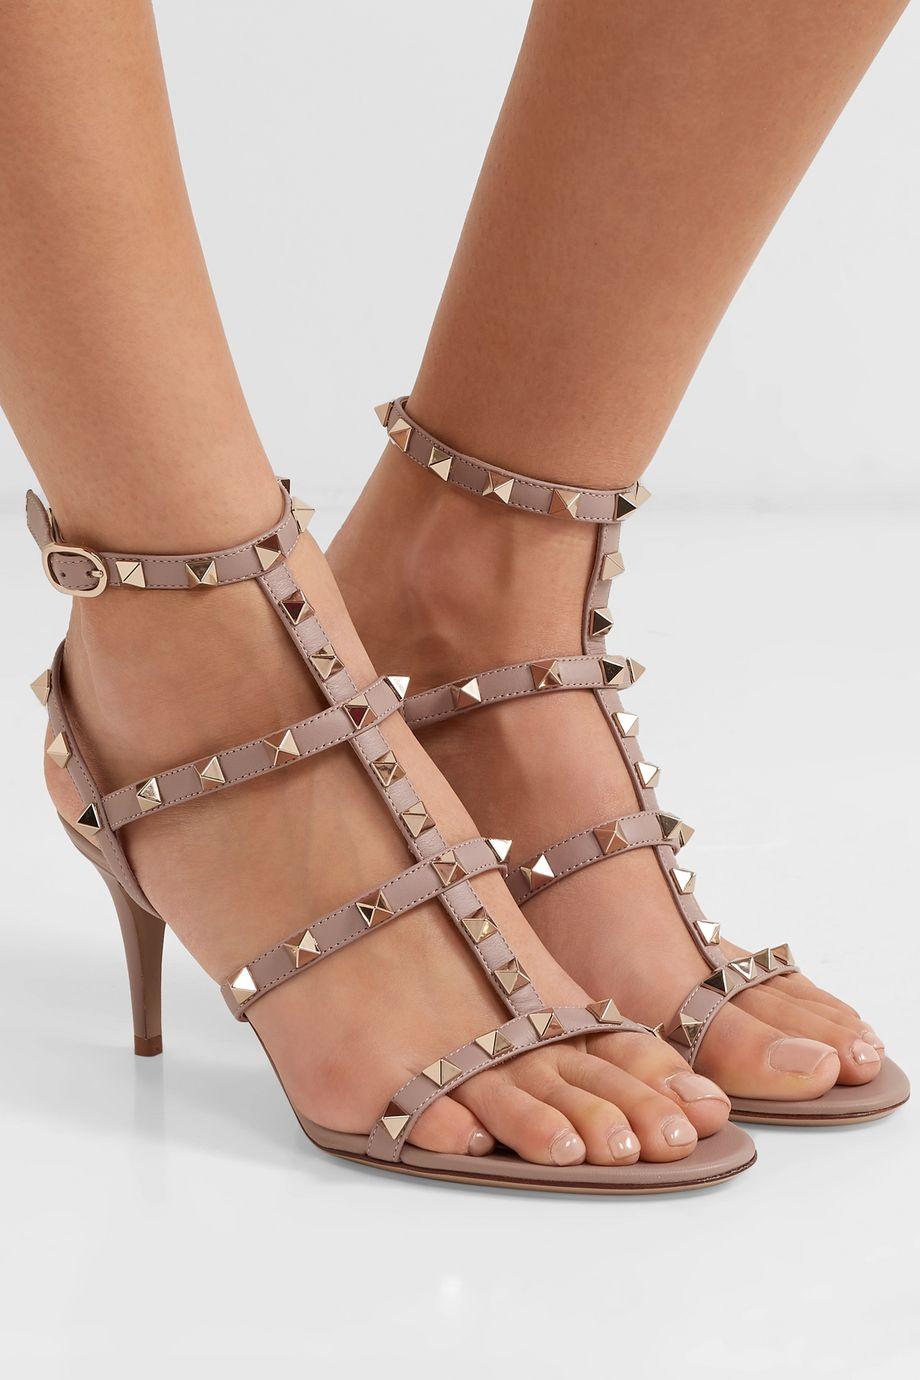 Valentino Valentino Garavani Rockstud 70 leather sandals